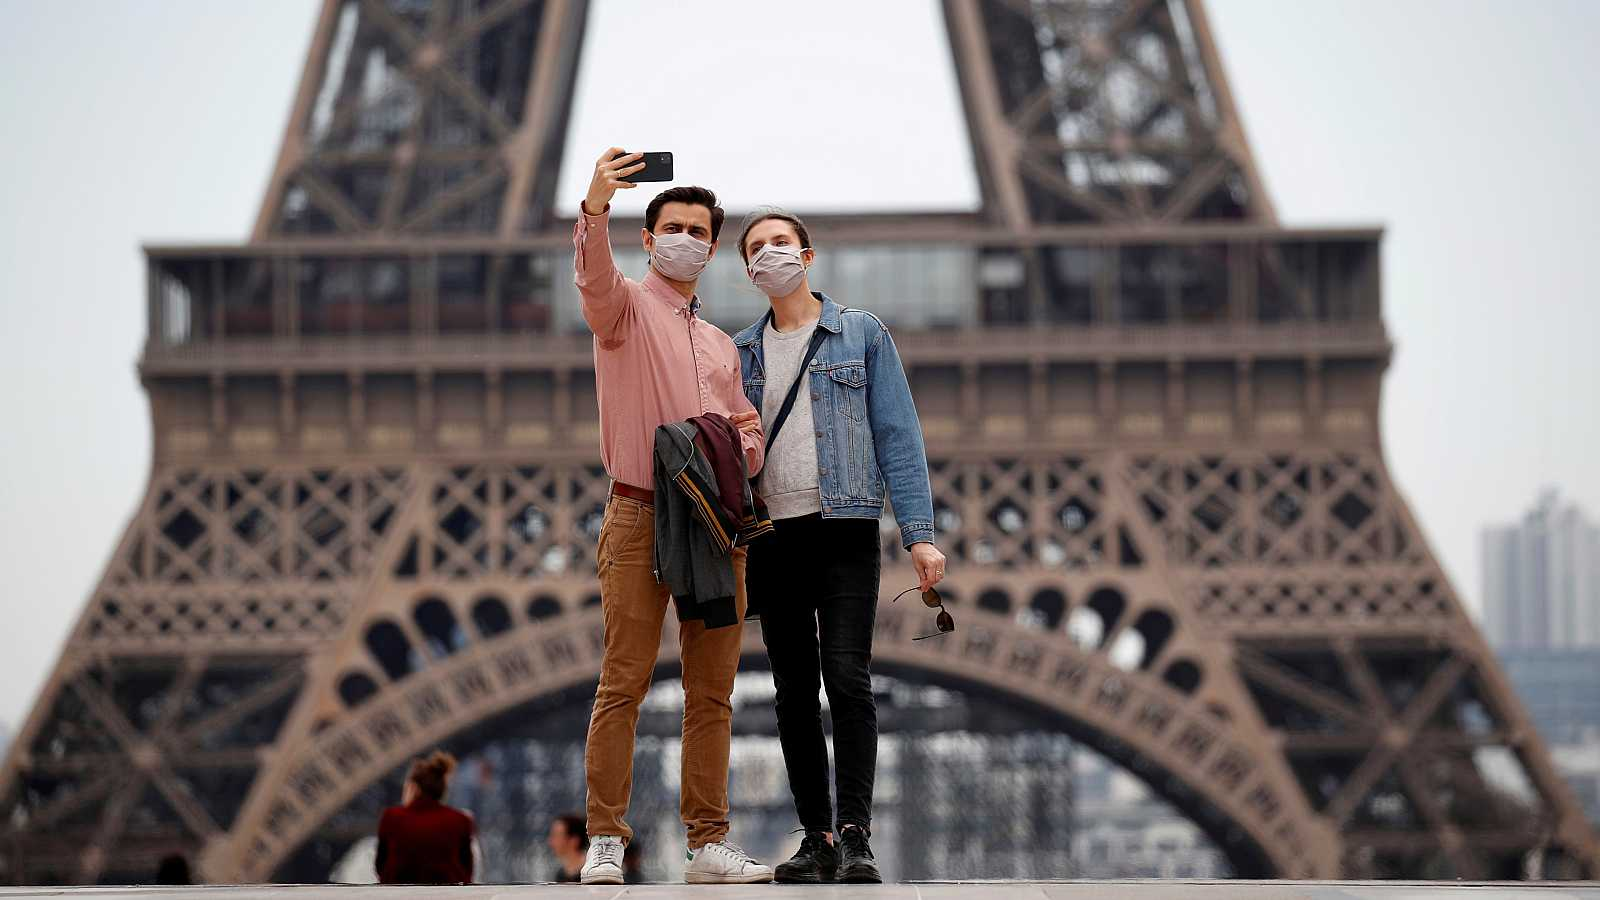 Una pareja se hace un 'selfie' frente a la Torre Eiffel de París.